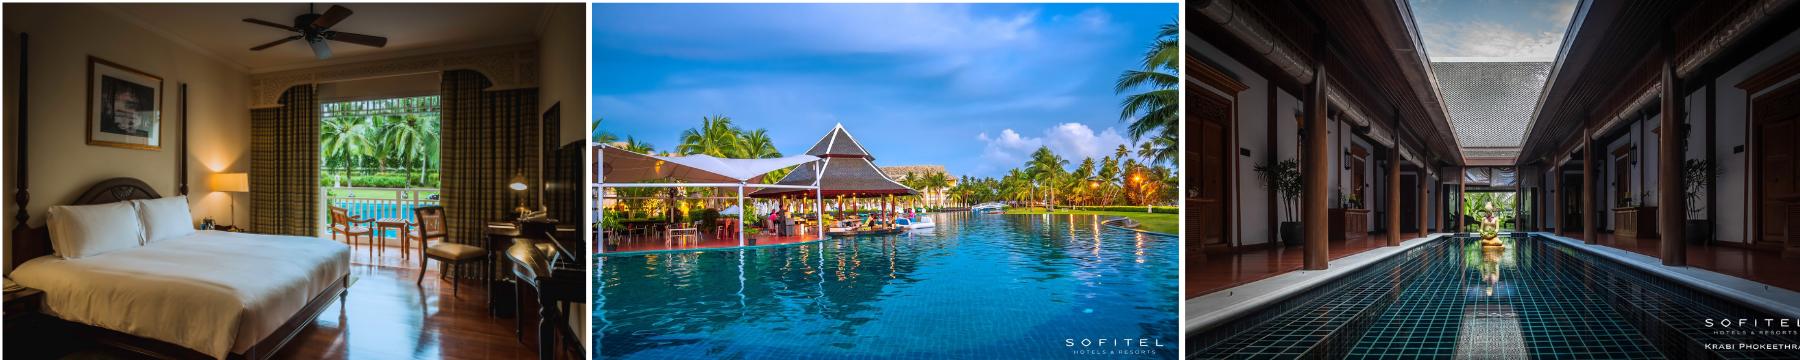 Sofitel Krabi Phokeethra Golf Spa Resort Timeless Beachside Elegance